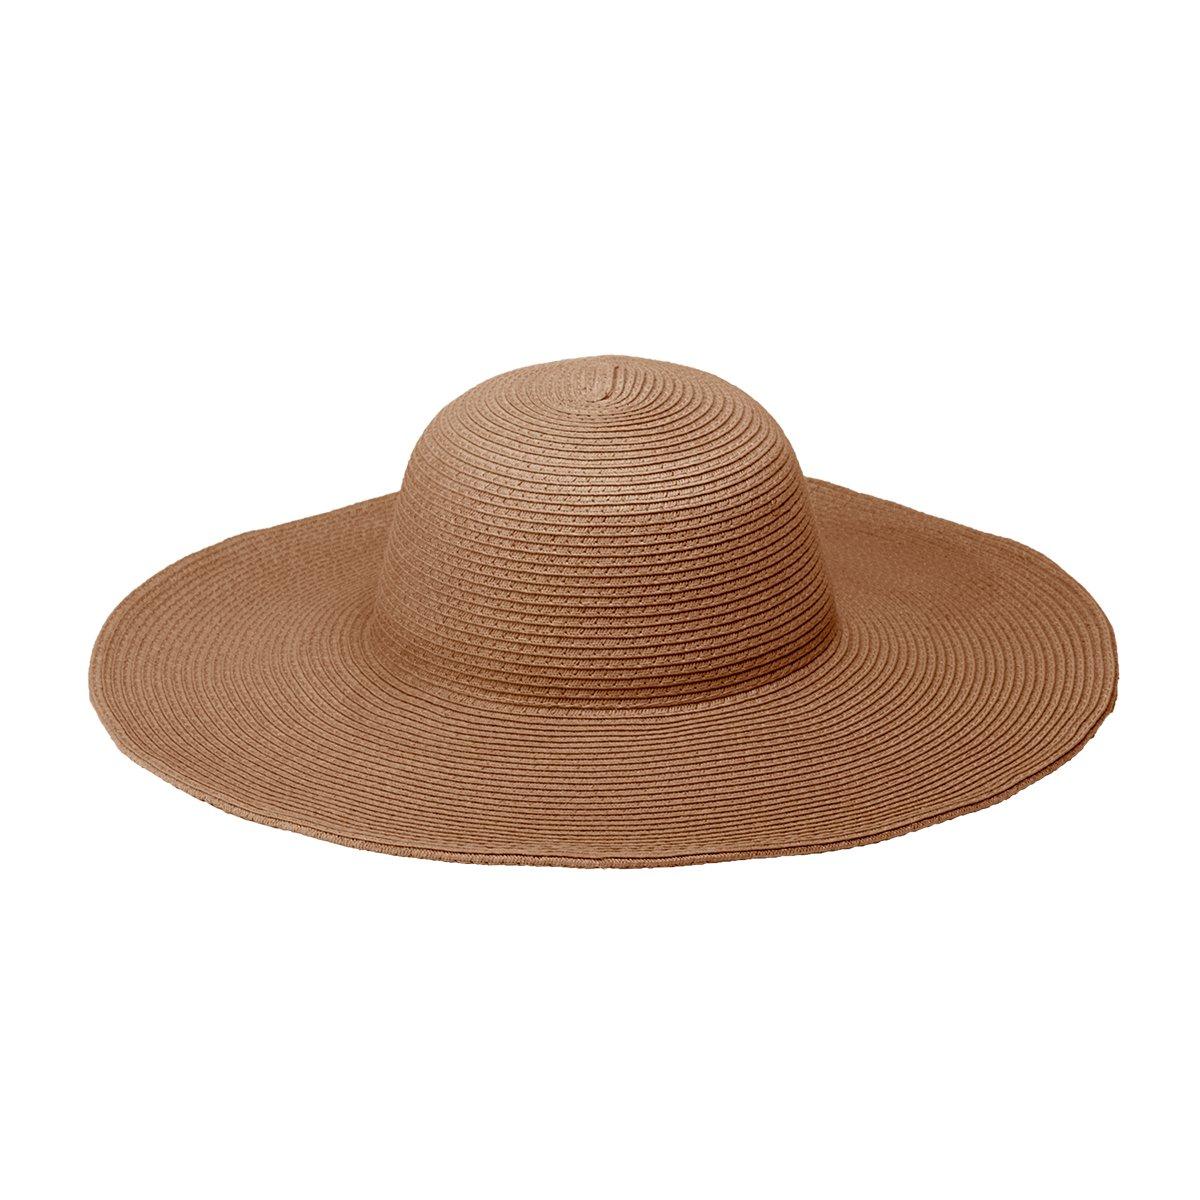 cbf6a92e5c3 Peter Grimm Women s Erin Resort Sun Hat - Black at Amazon Women s Clothing  store